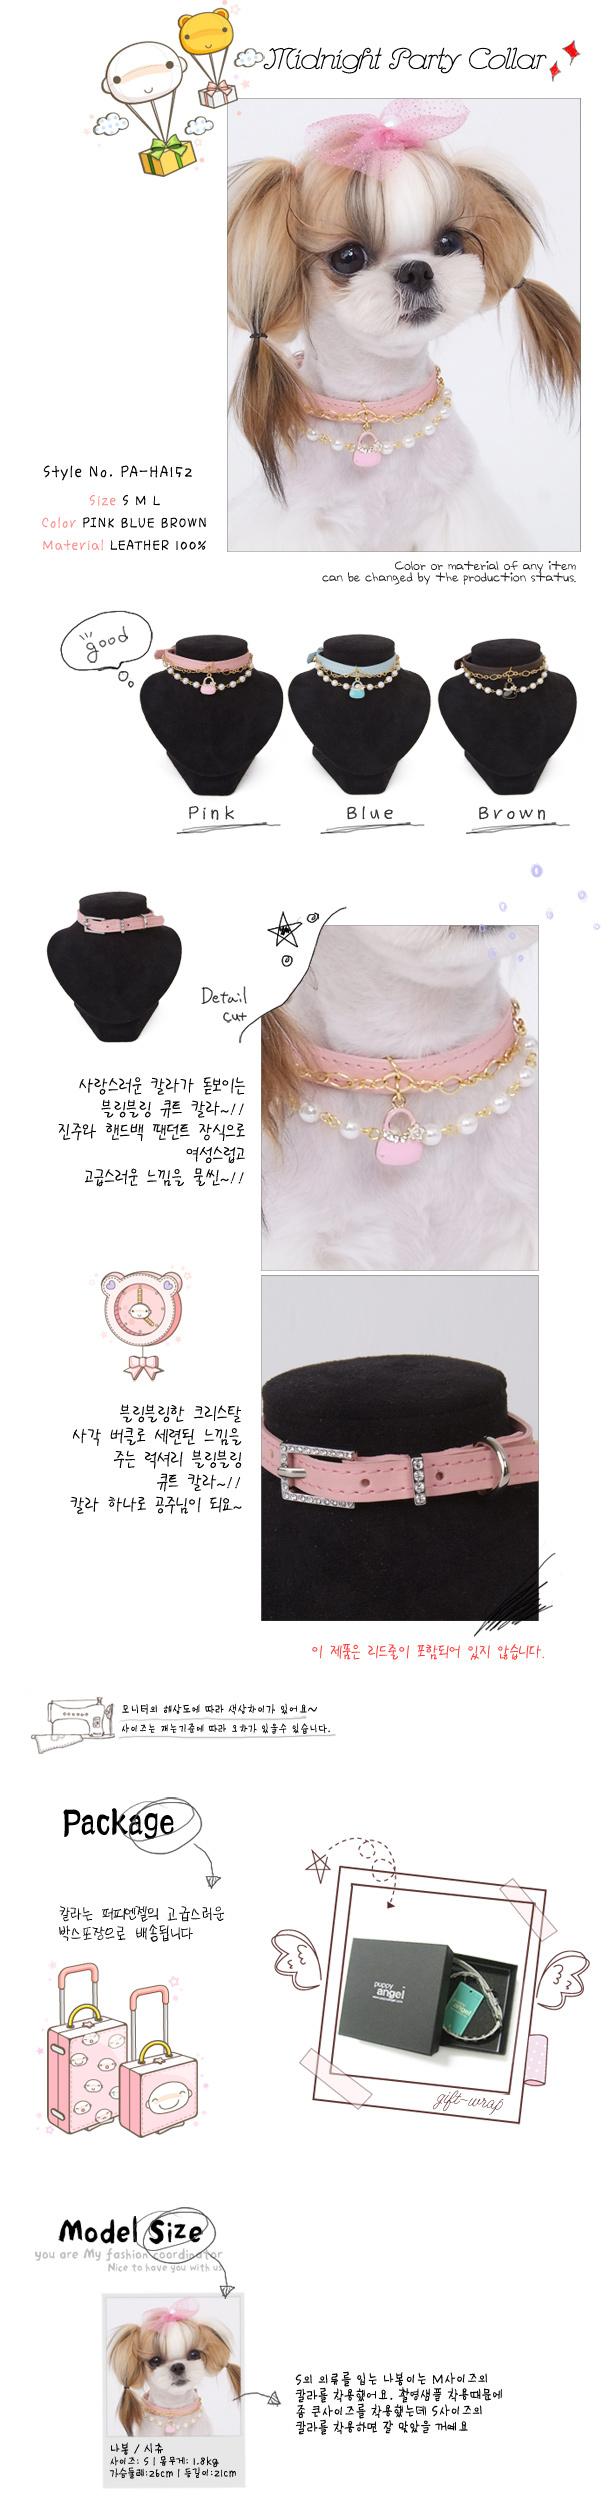 Midnight Party Collar